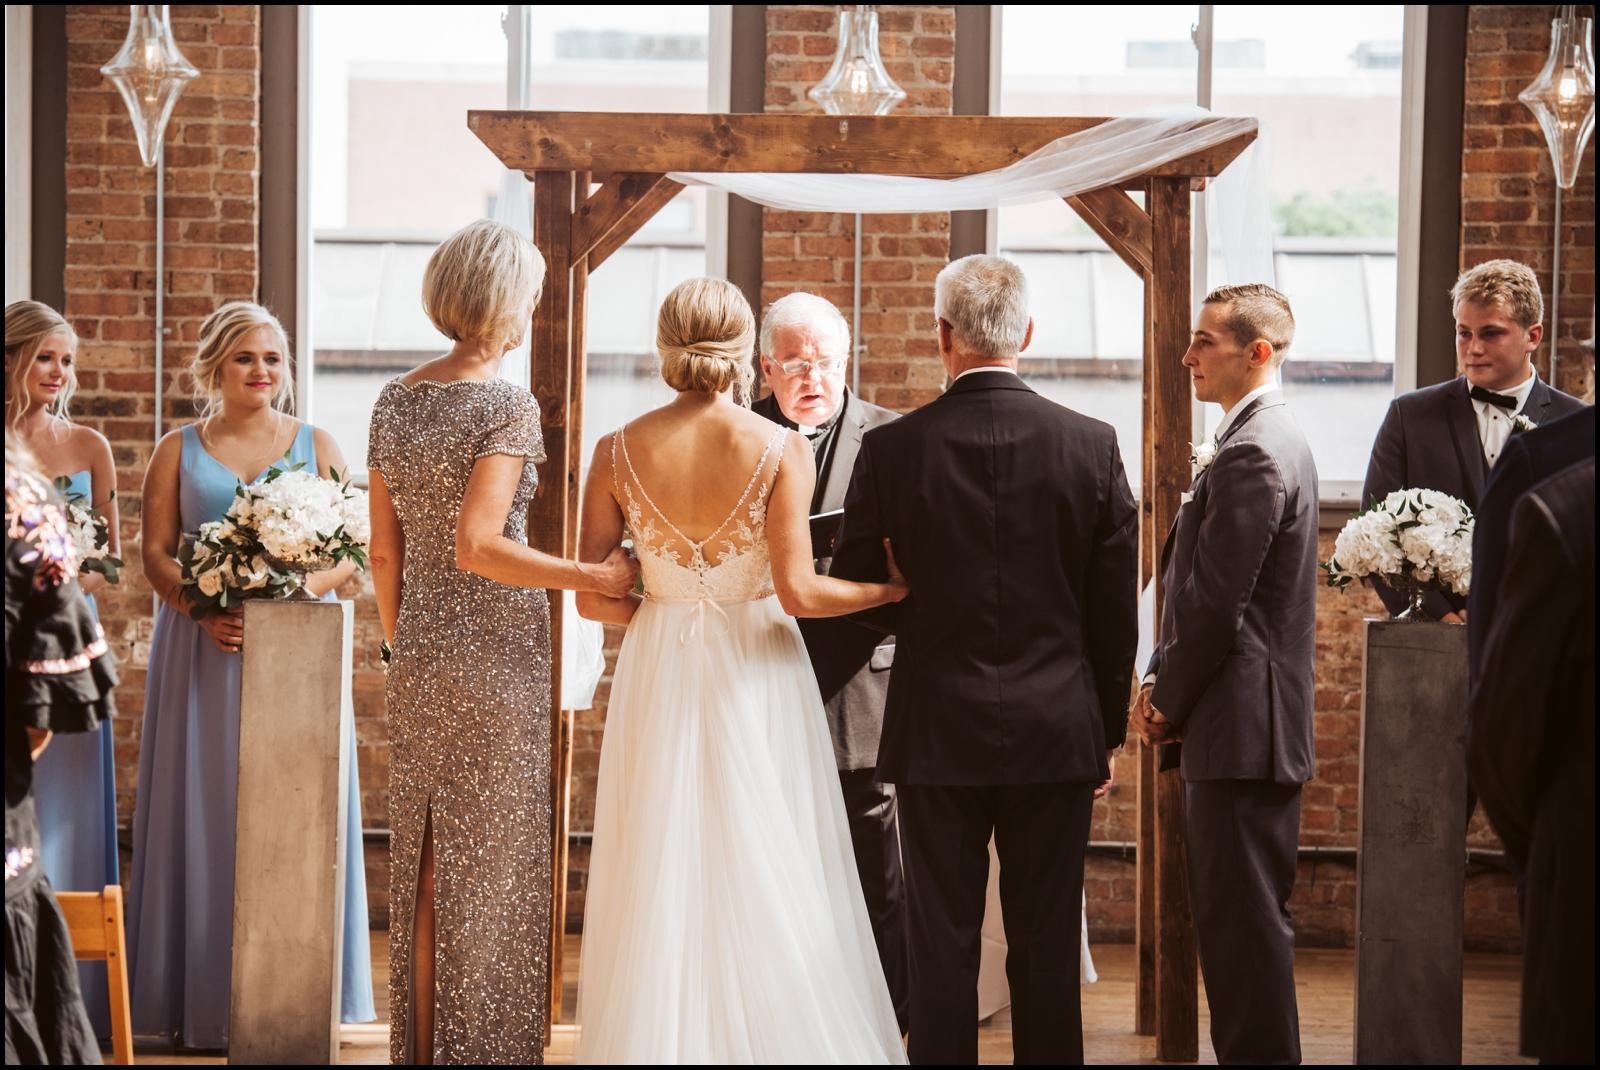 Rustic Chicago wedding